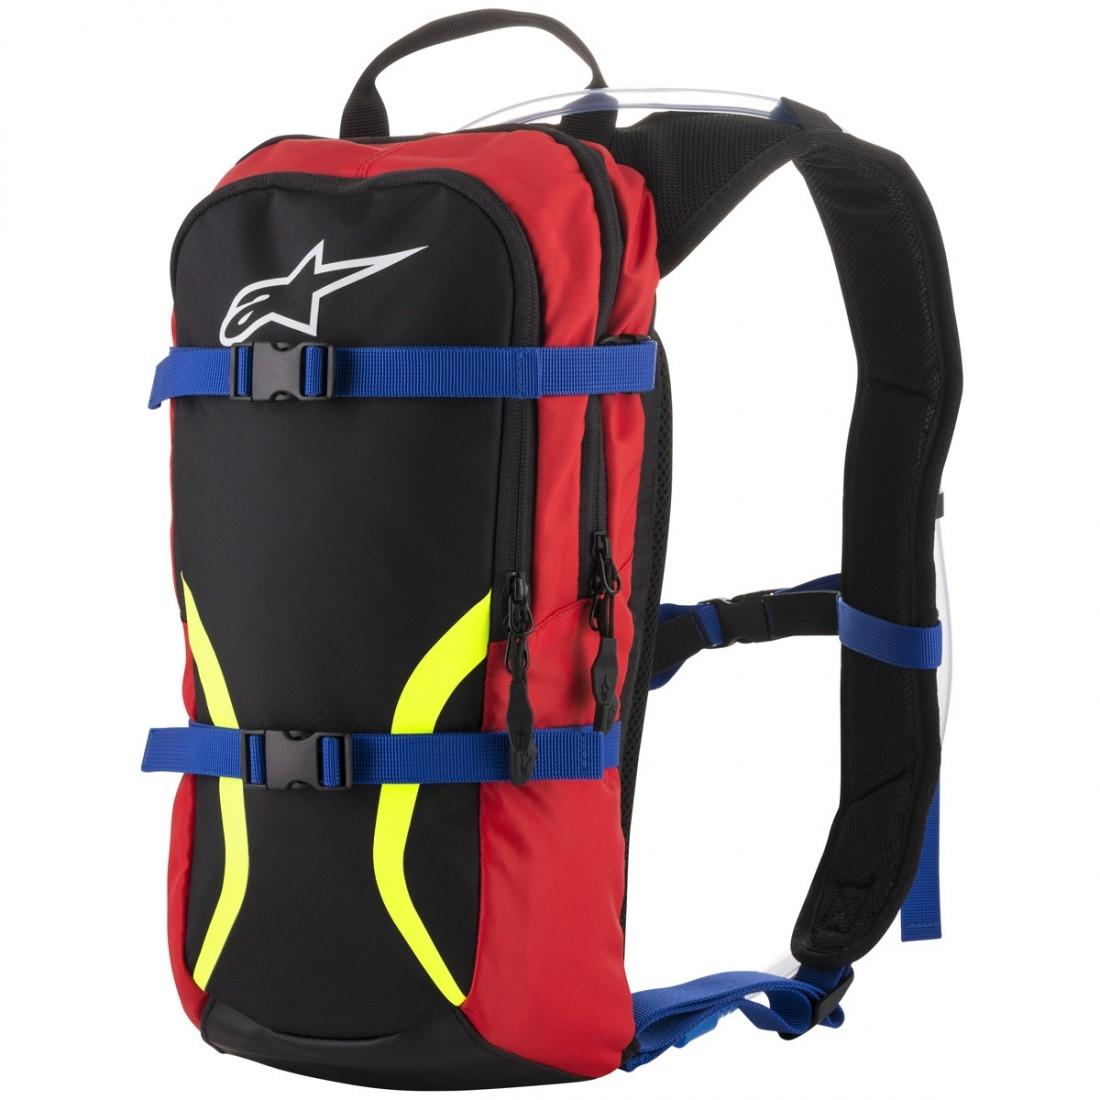 f6f0ab8d31 ALPINESTARS Iguana Hydration Black / Blue / Red / Yellow Fluo Bag · Motocard